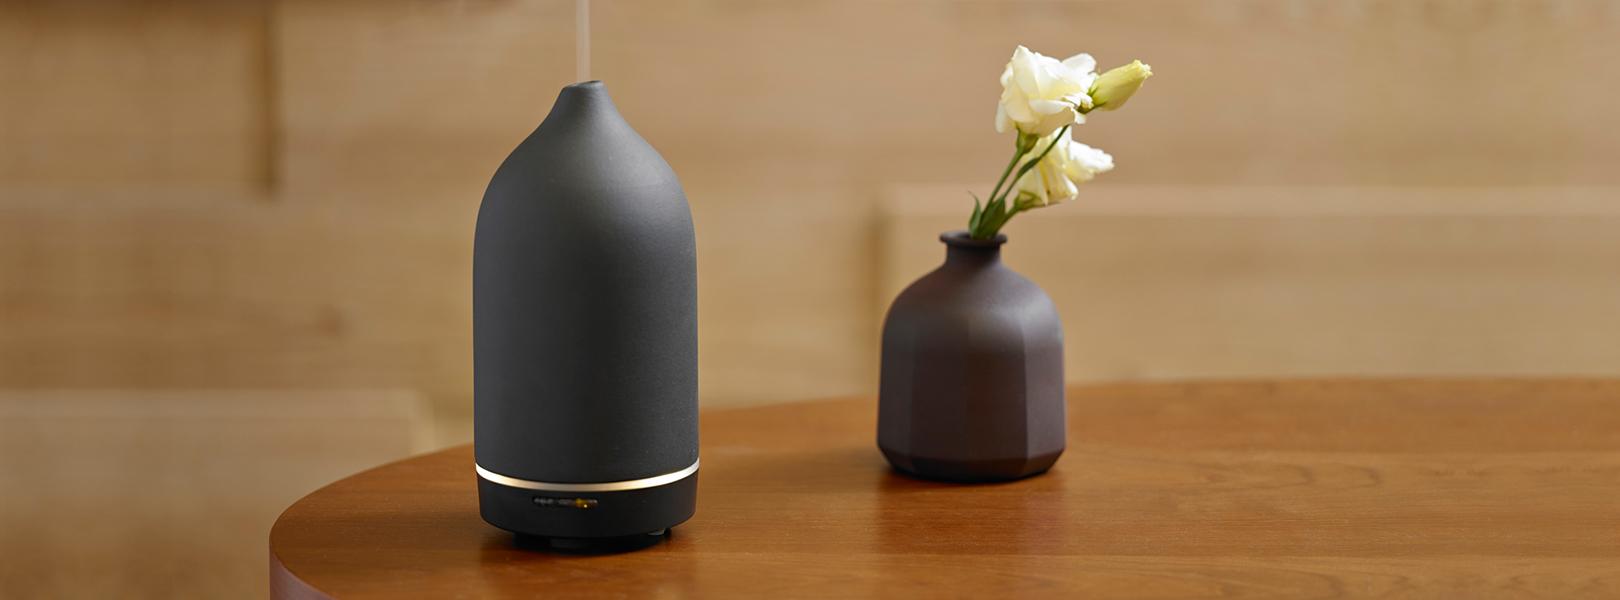 http://www.toastliving.com/img/files/product/MEMORY/LT06011_big_3.jpg